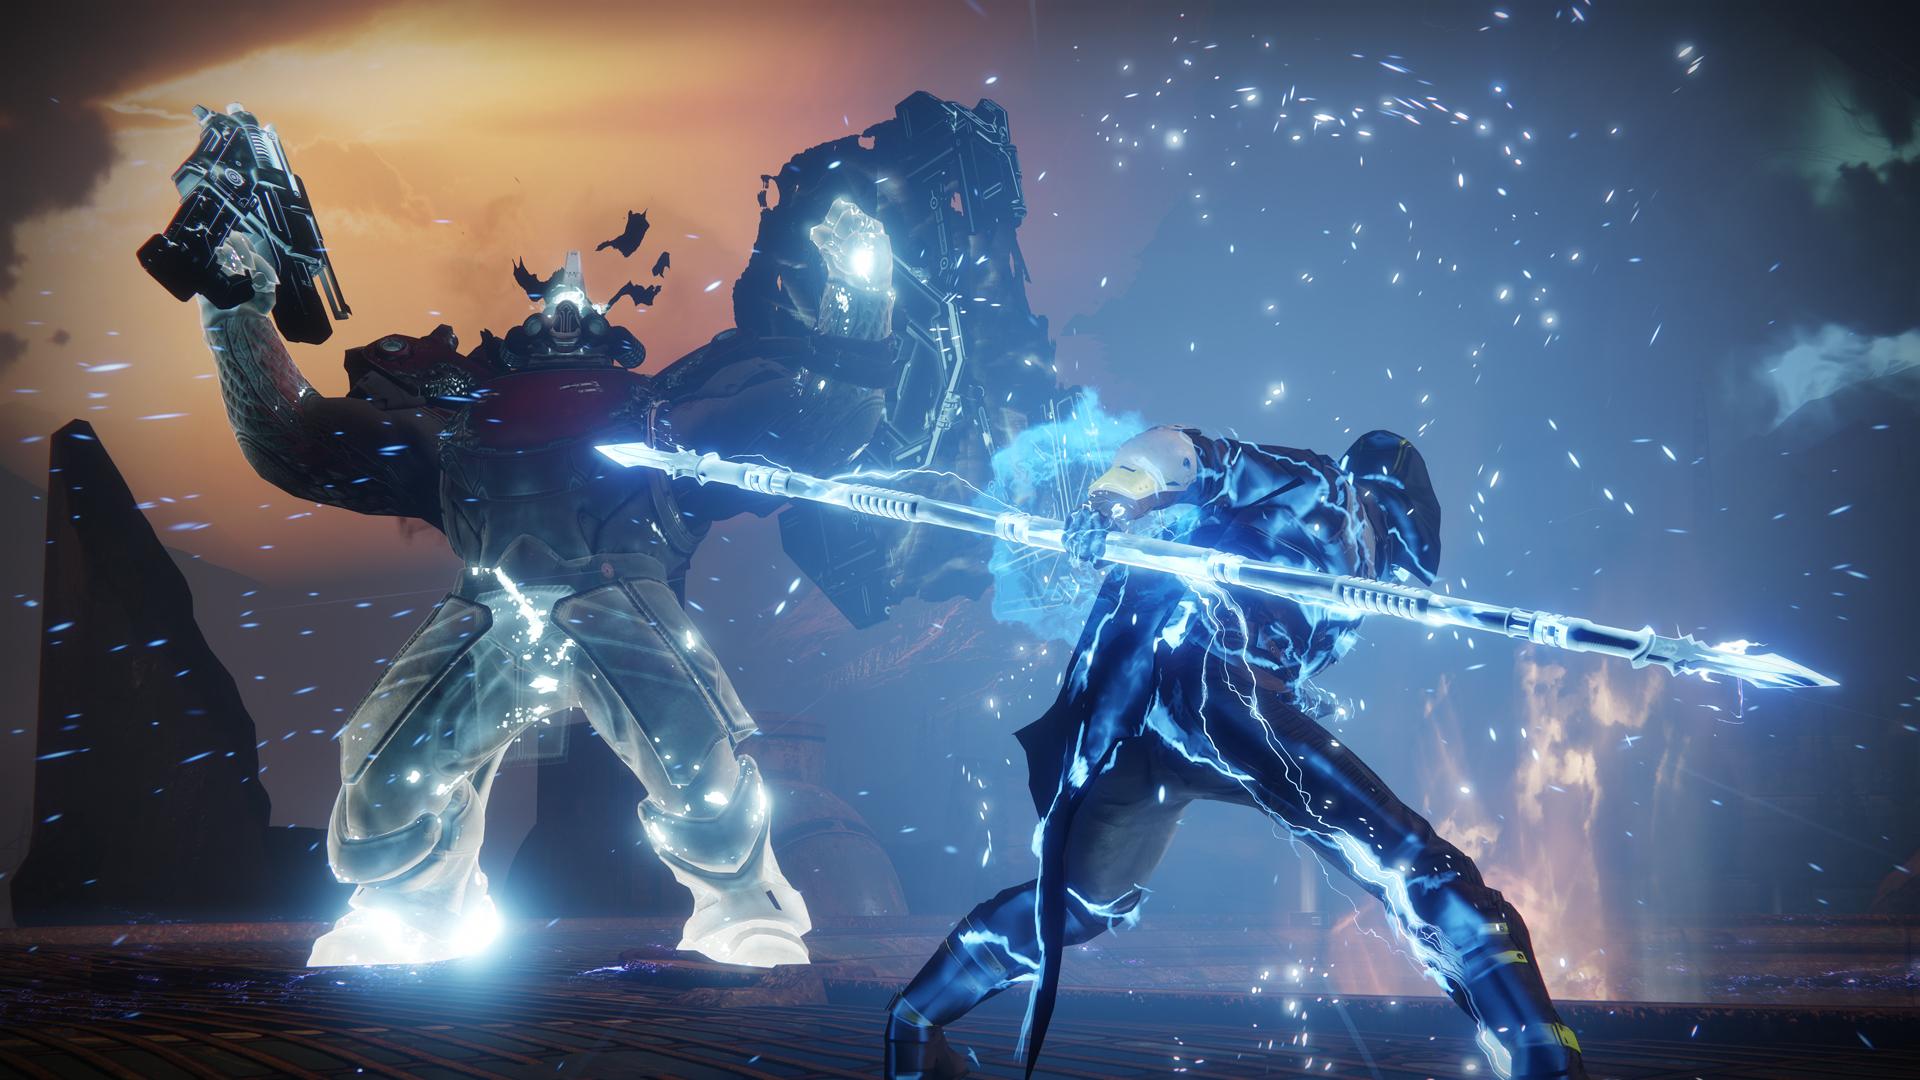 La beta de Destiny 2 llegará el 18 de julio a PS4